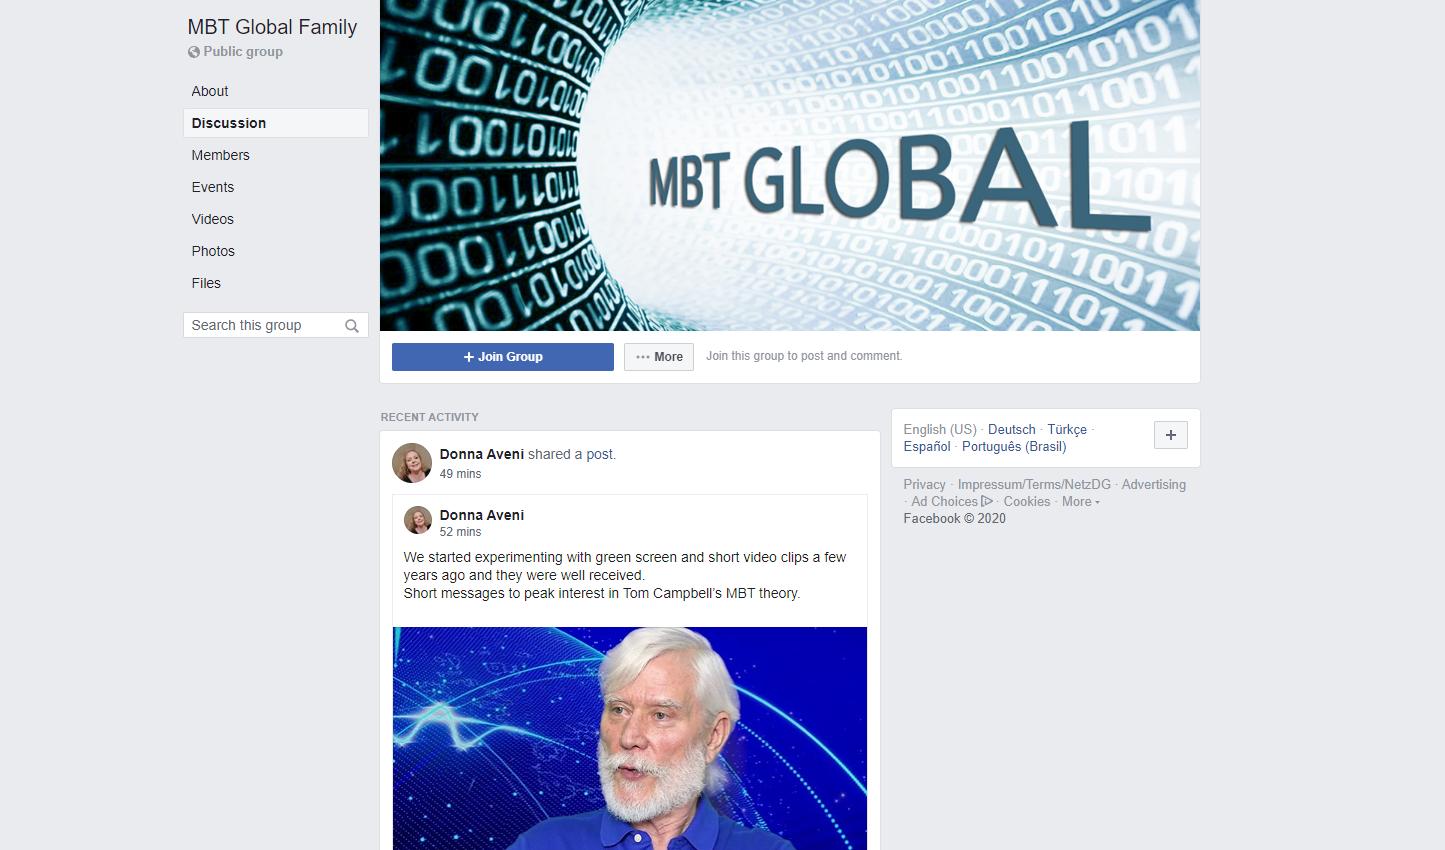 MBT Global Family